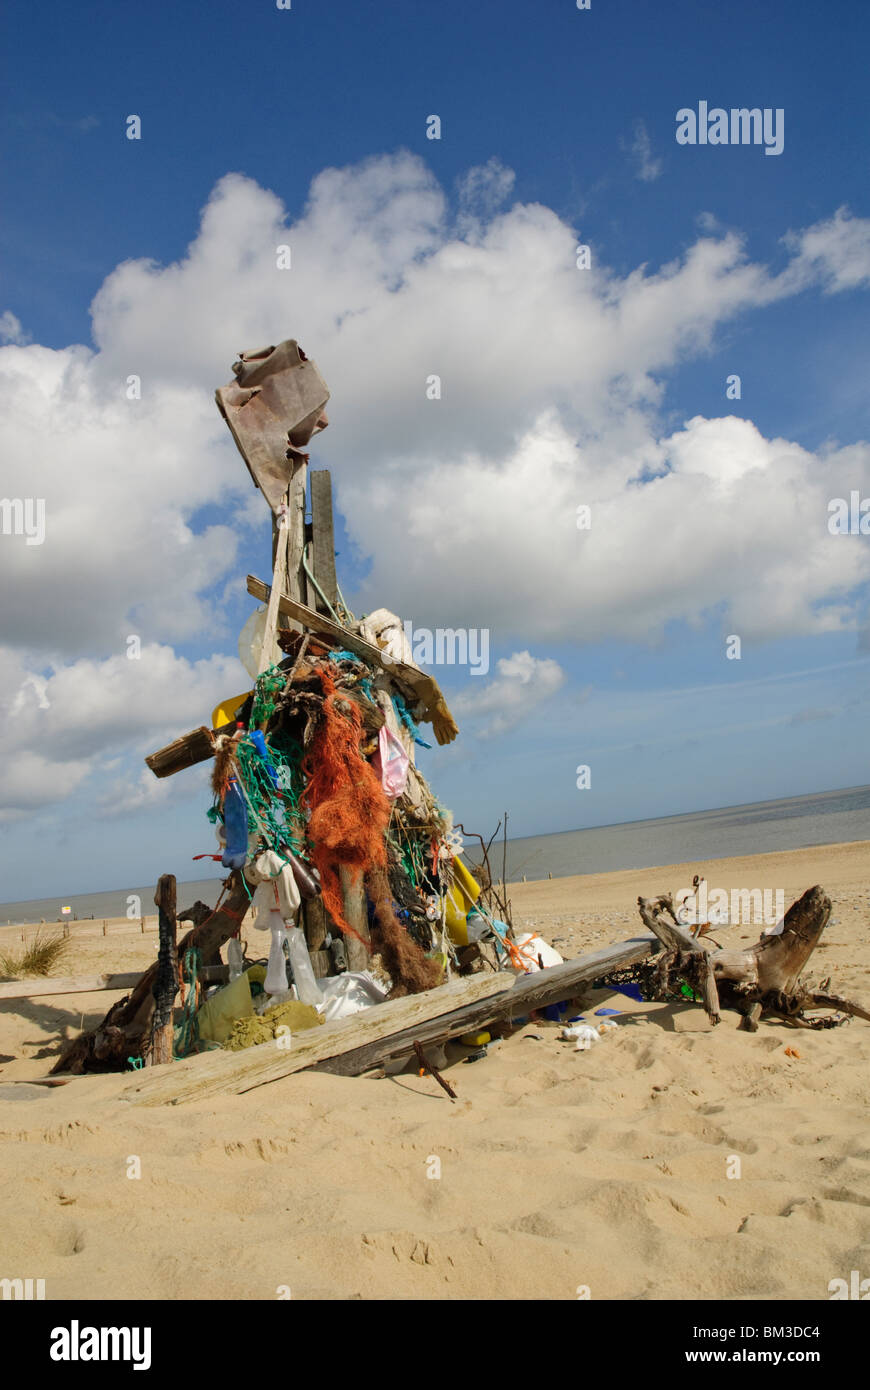 Sculpture made of flotsam and jetsam on Winterton beach,Norfolk,UK - Stock Image